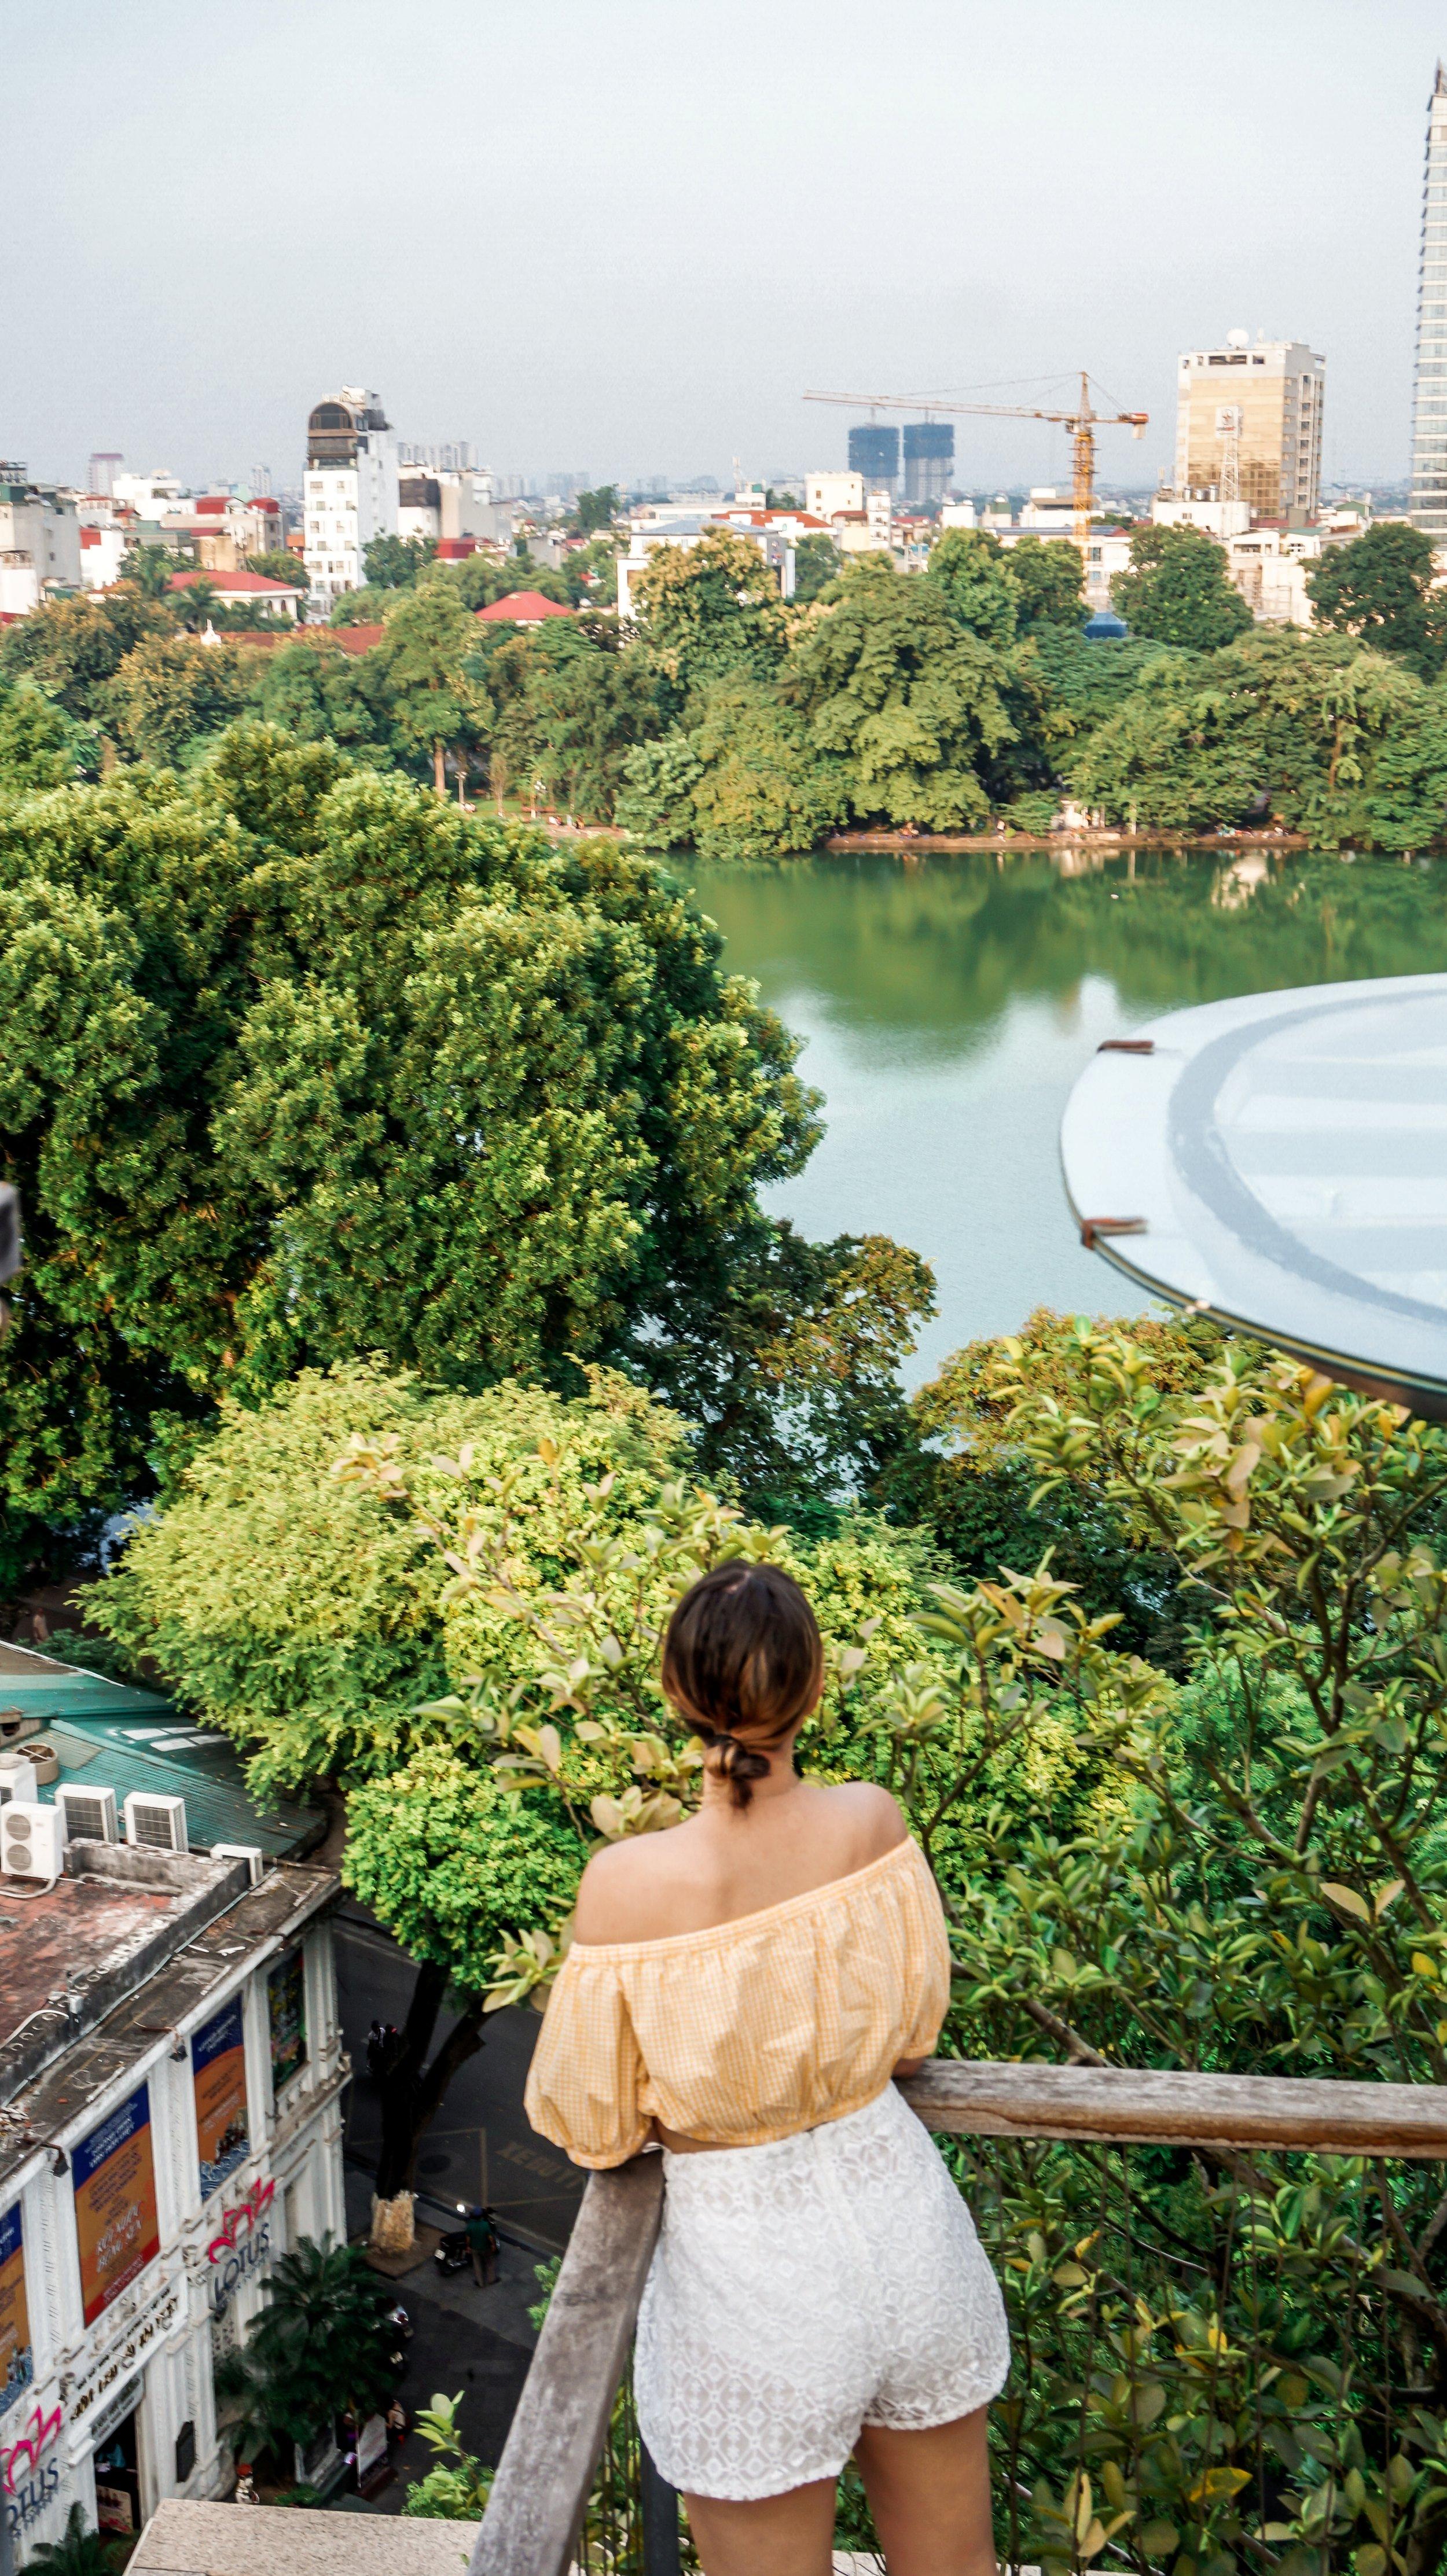 apricot-hotel-rooftop-bar-2019.jpg